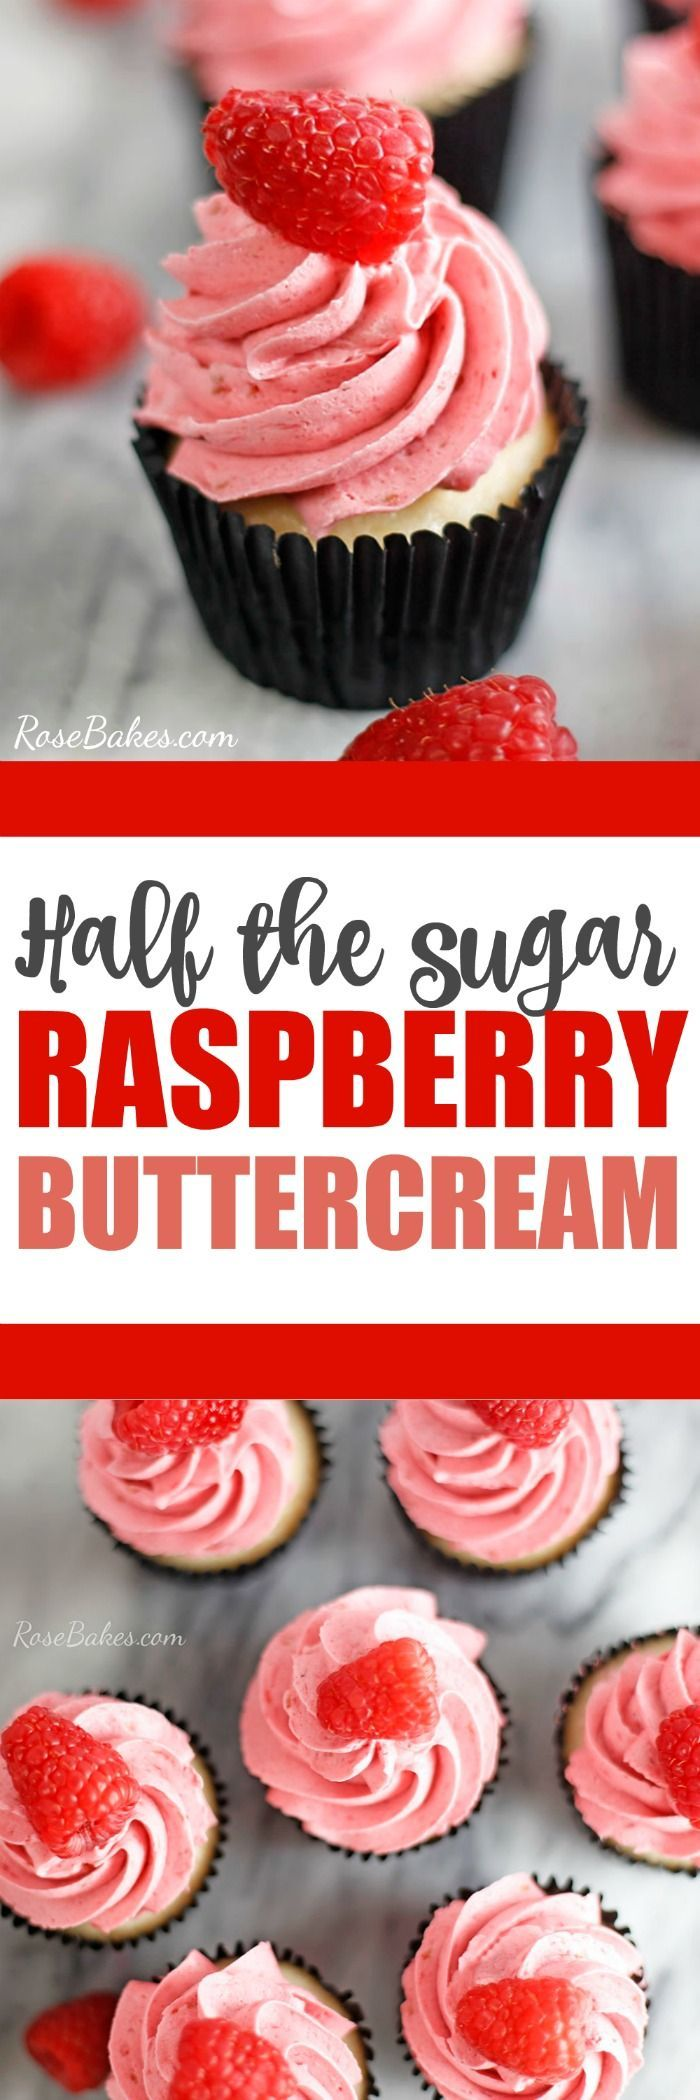 half the sugar raspberry buttercream #buttercream #raspberry #frosting #recipe